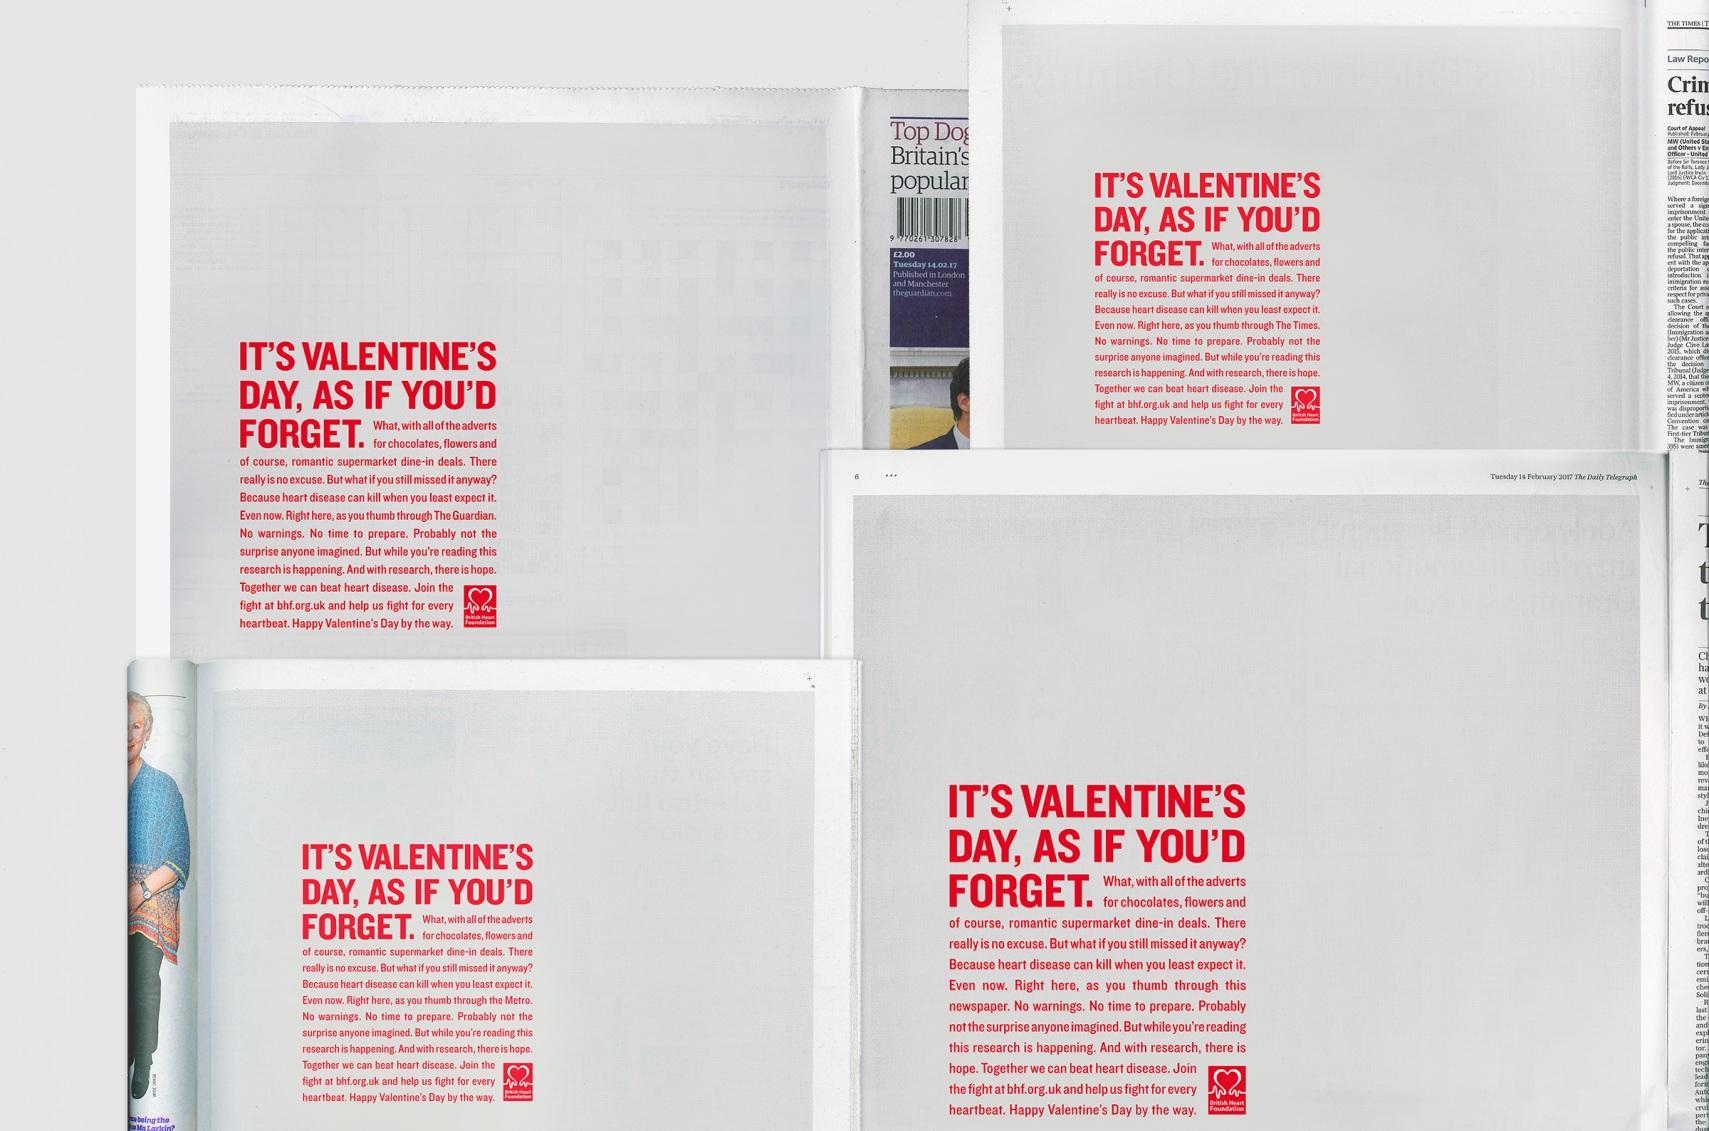 BHF_1f_ValentinesPapers.jpg